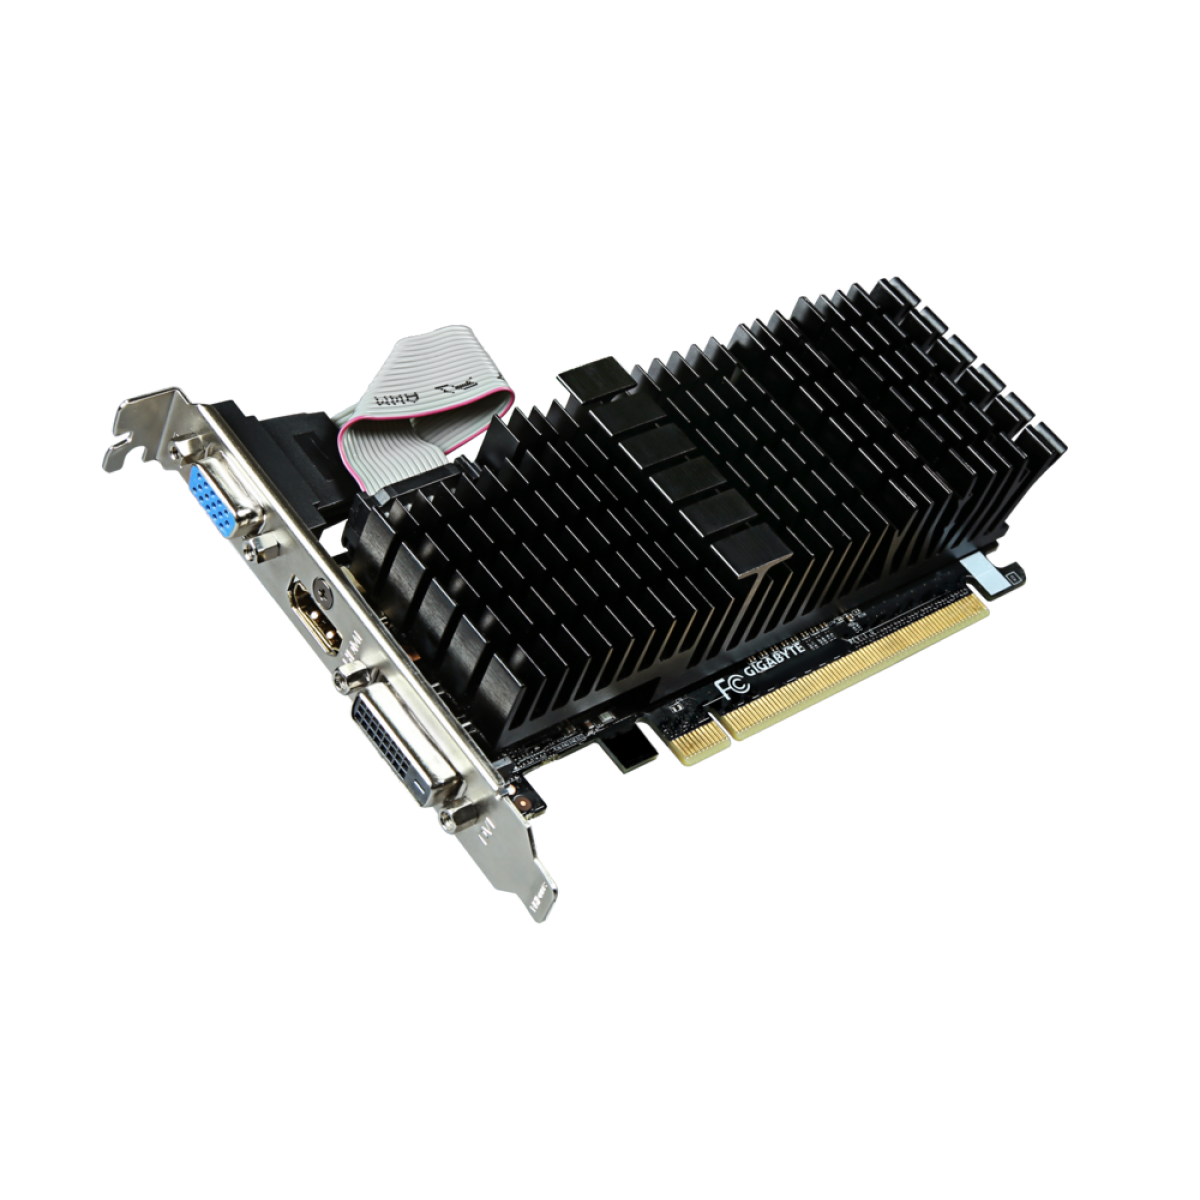 Placa de Vídeo Gigabyte GeForce GT 710, 2GB, DDR3, 64bit, GV-N710SL-2GL